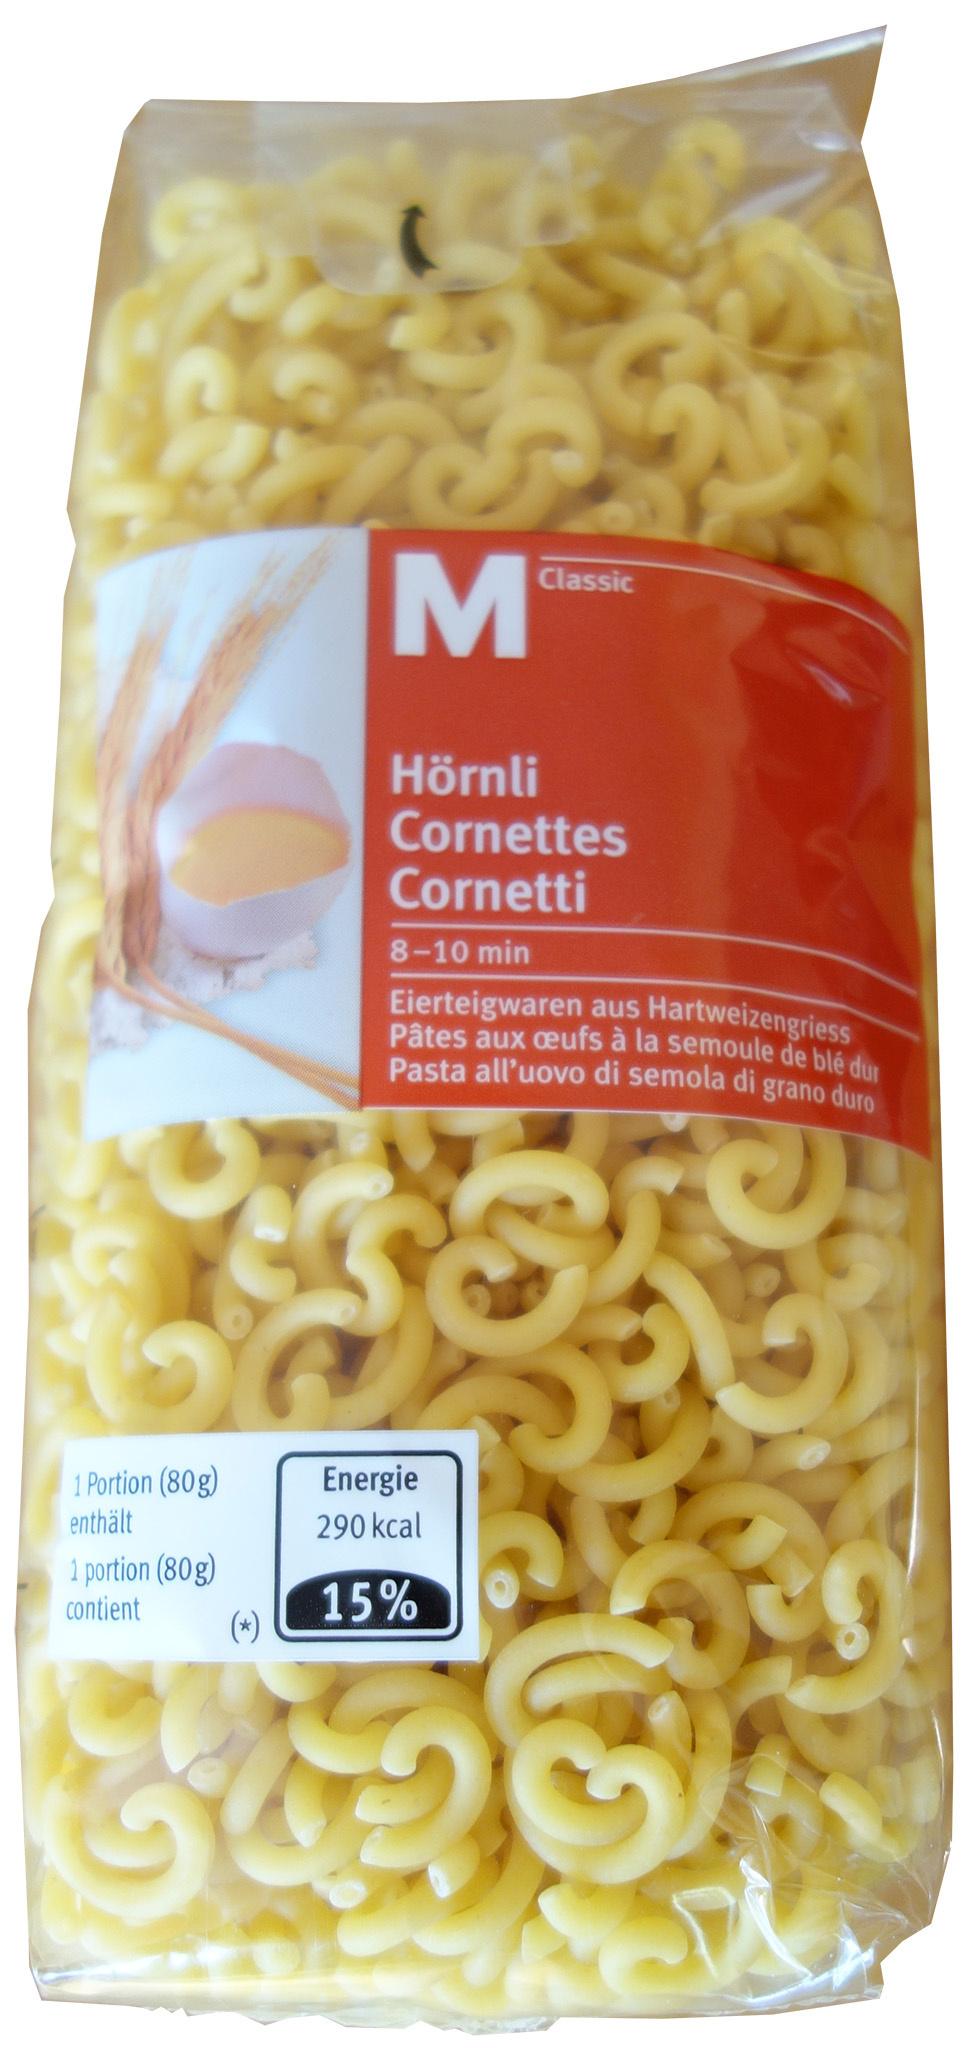 Cornettes M-Classic - Product